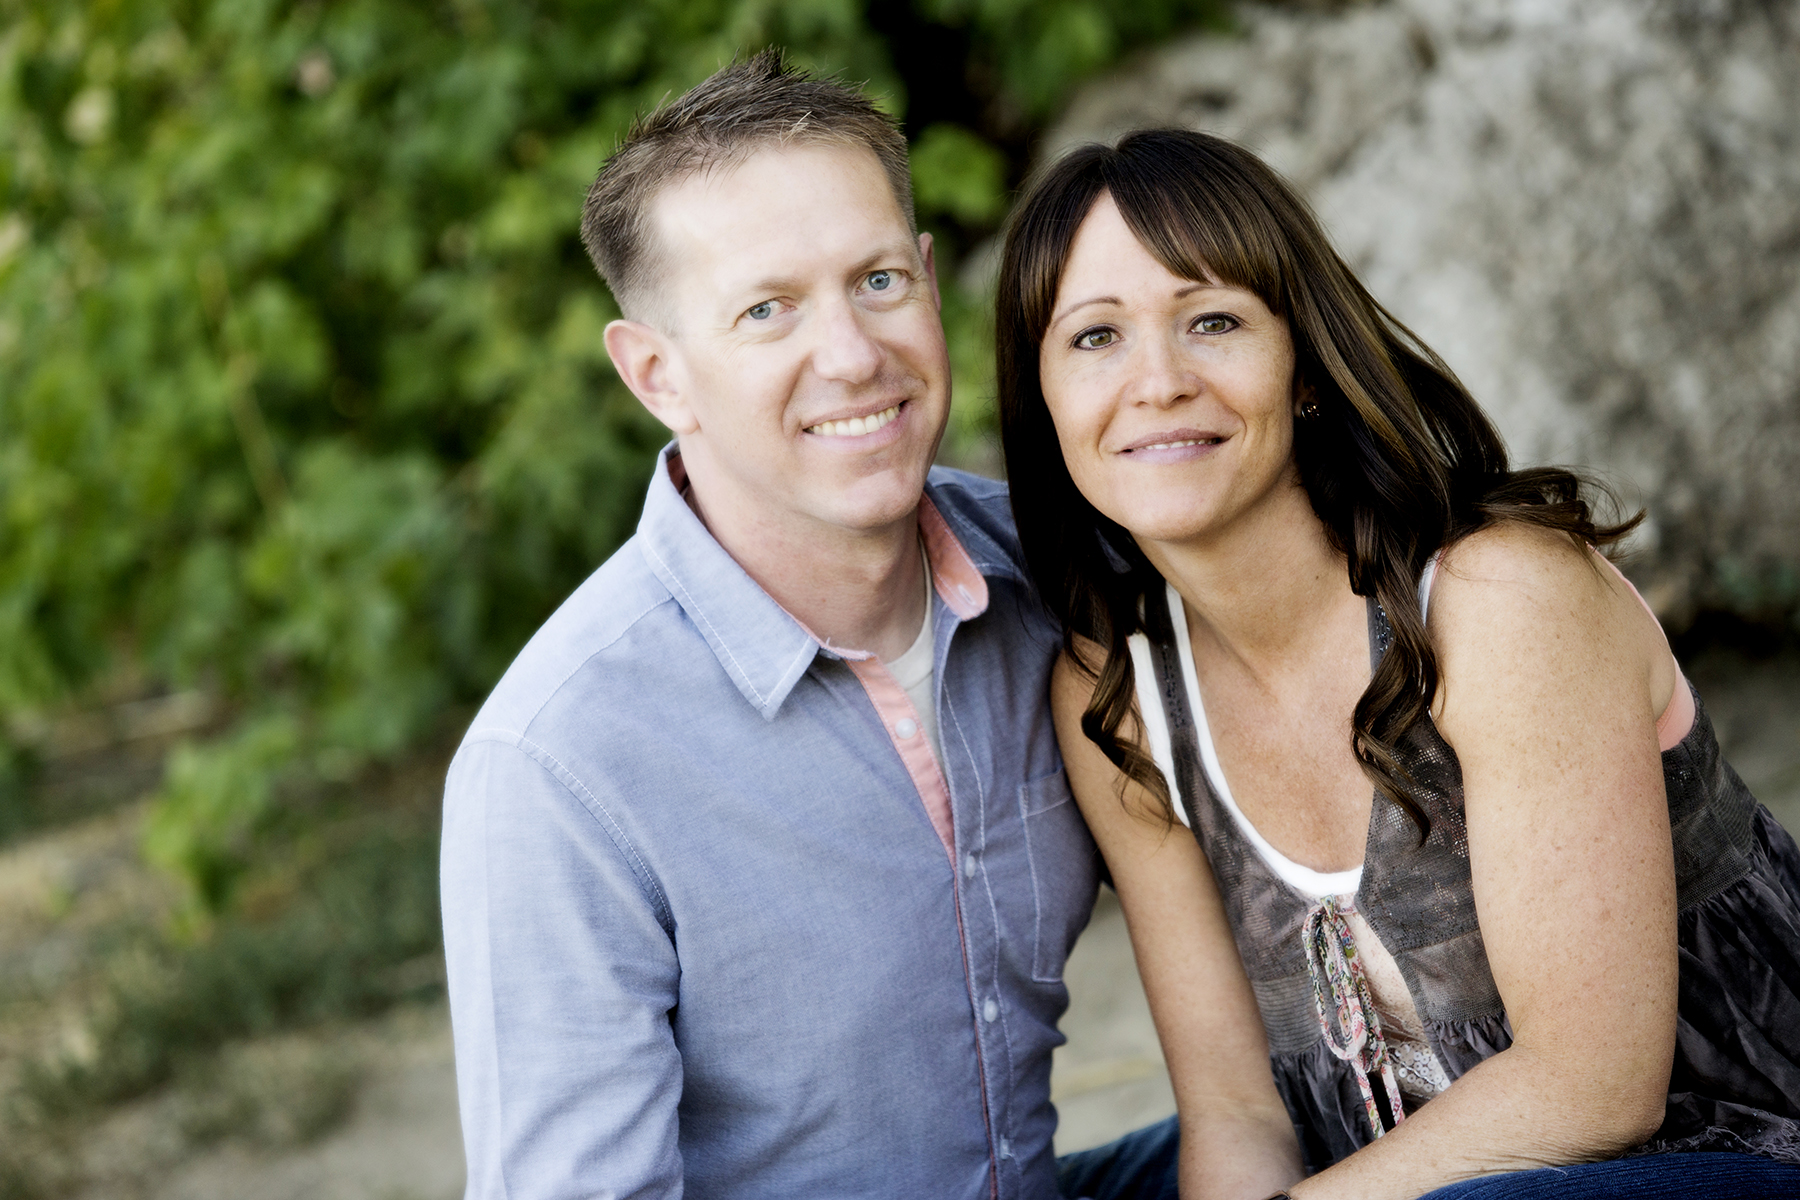 Utah Couple Photos tender smile happy